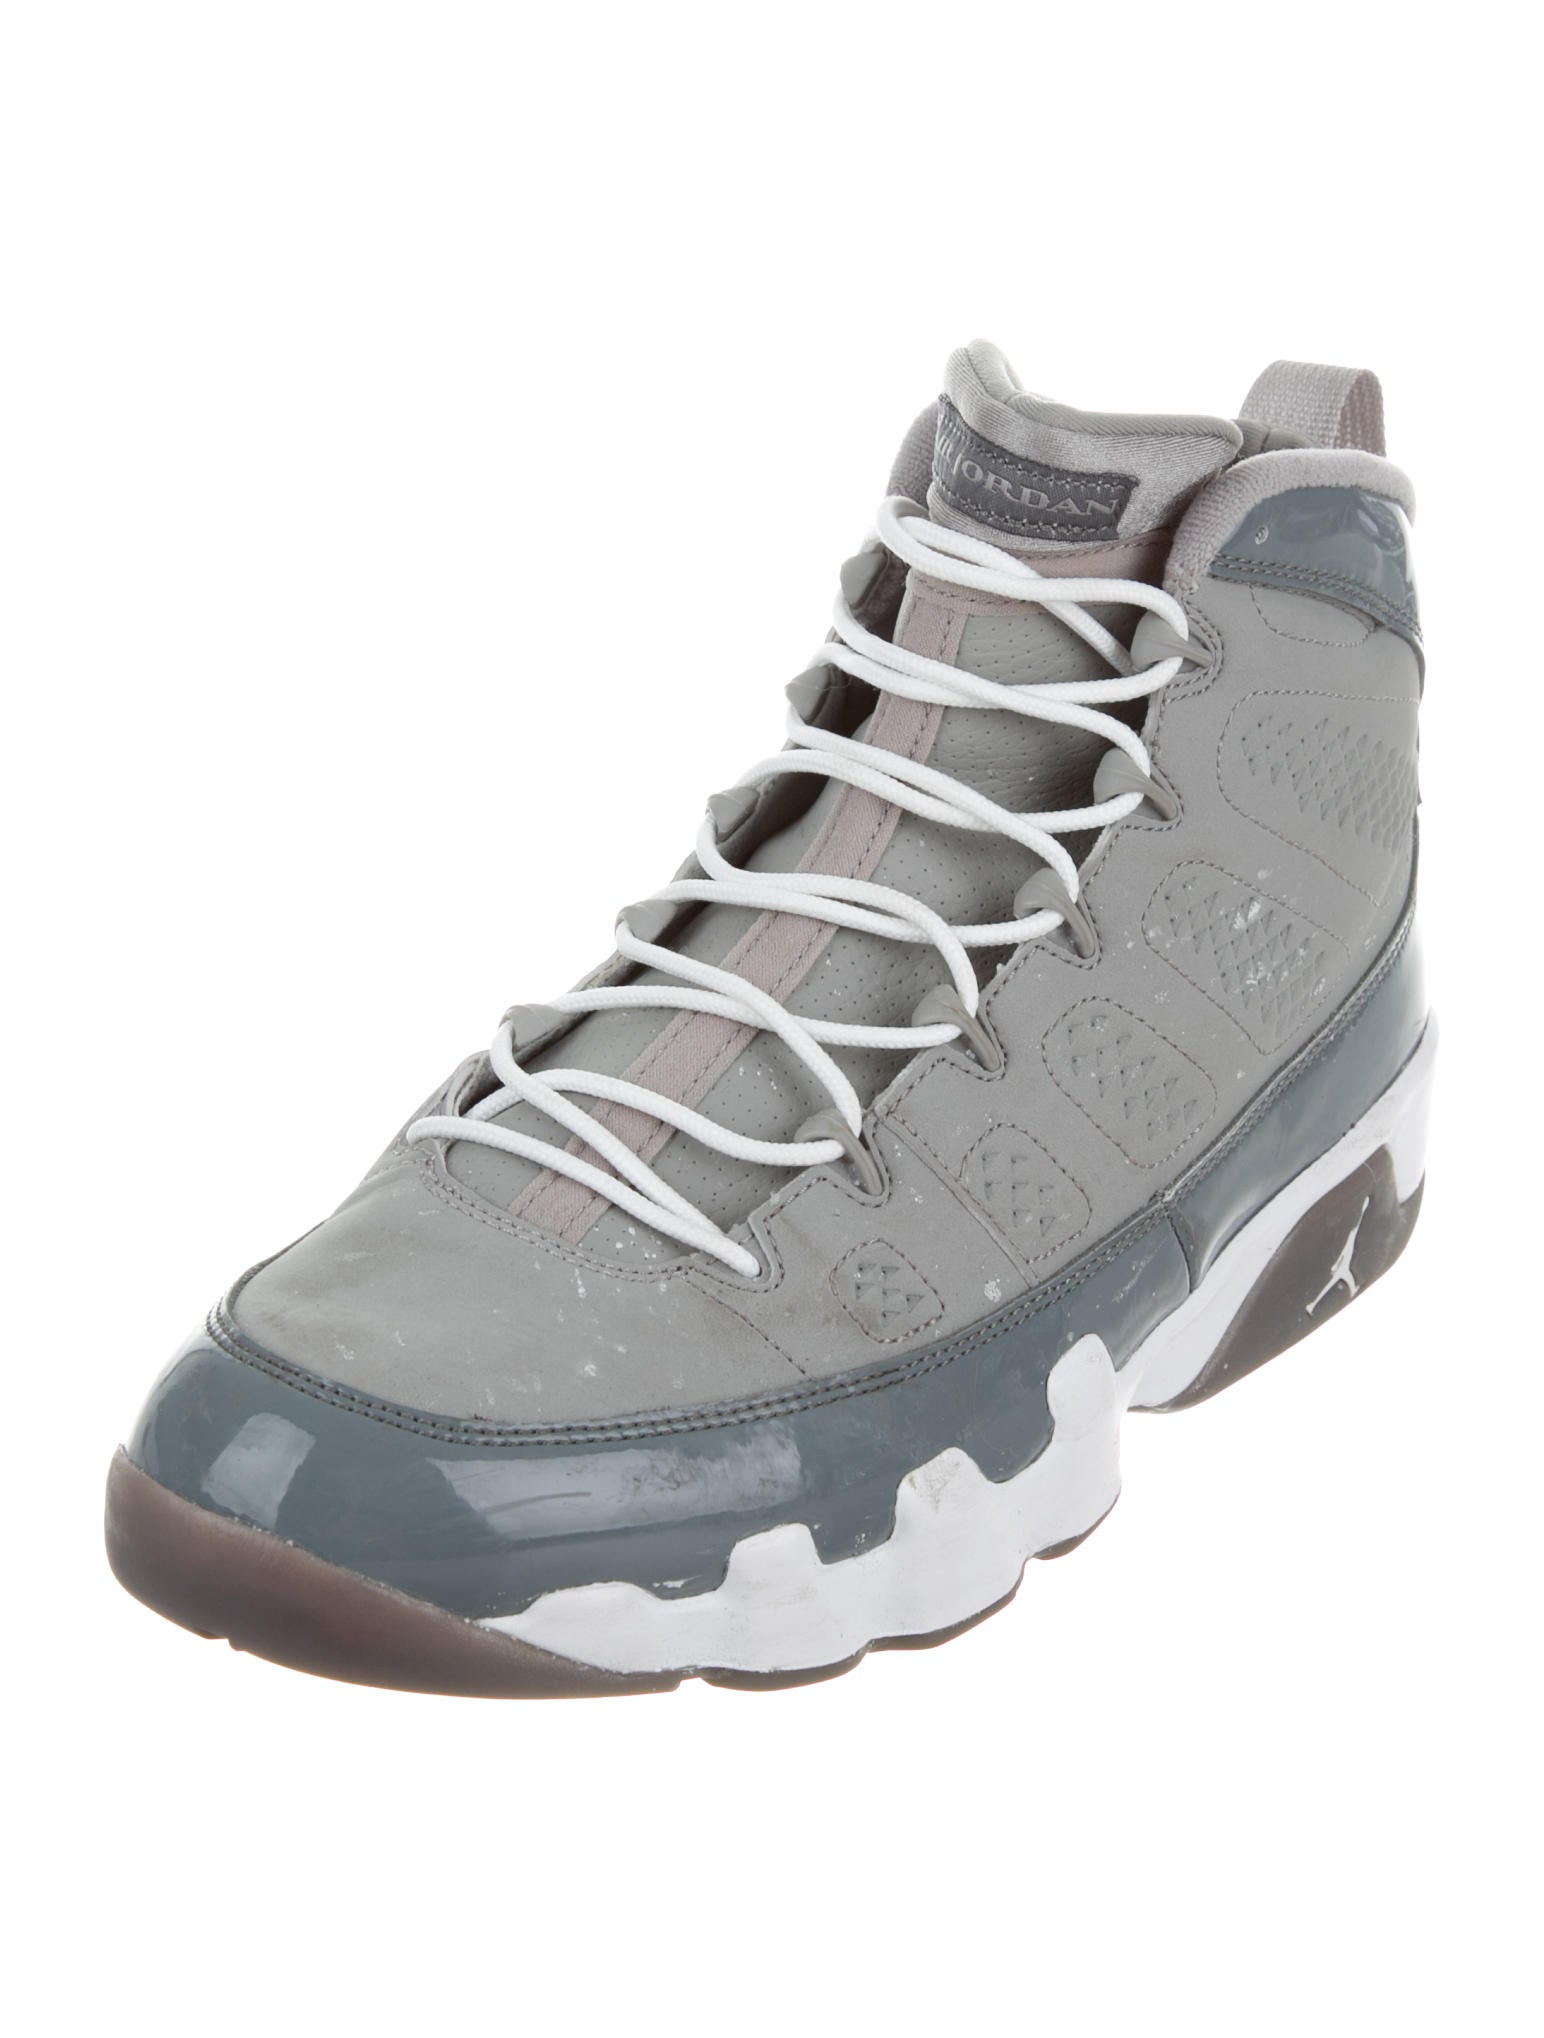 nike air jordan 9 retro high top sneakers shoes wniaj20067 the realreal. Black Bedroom Furniture Sets. Home Design Ideas